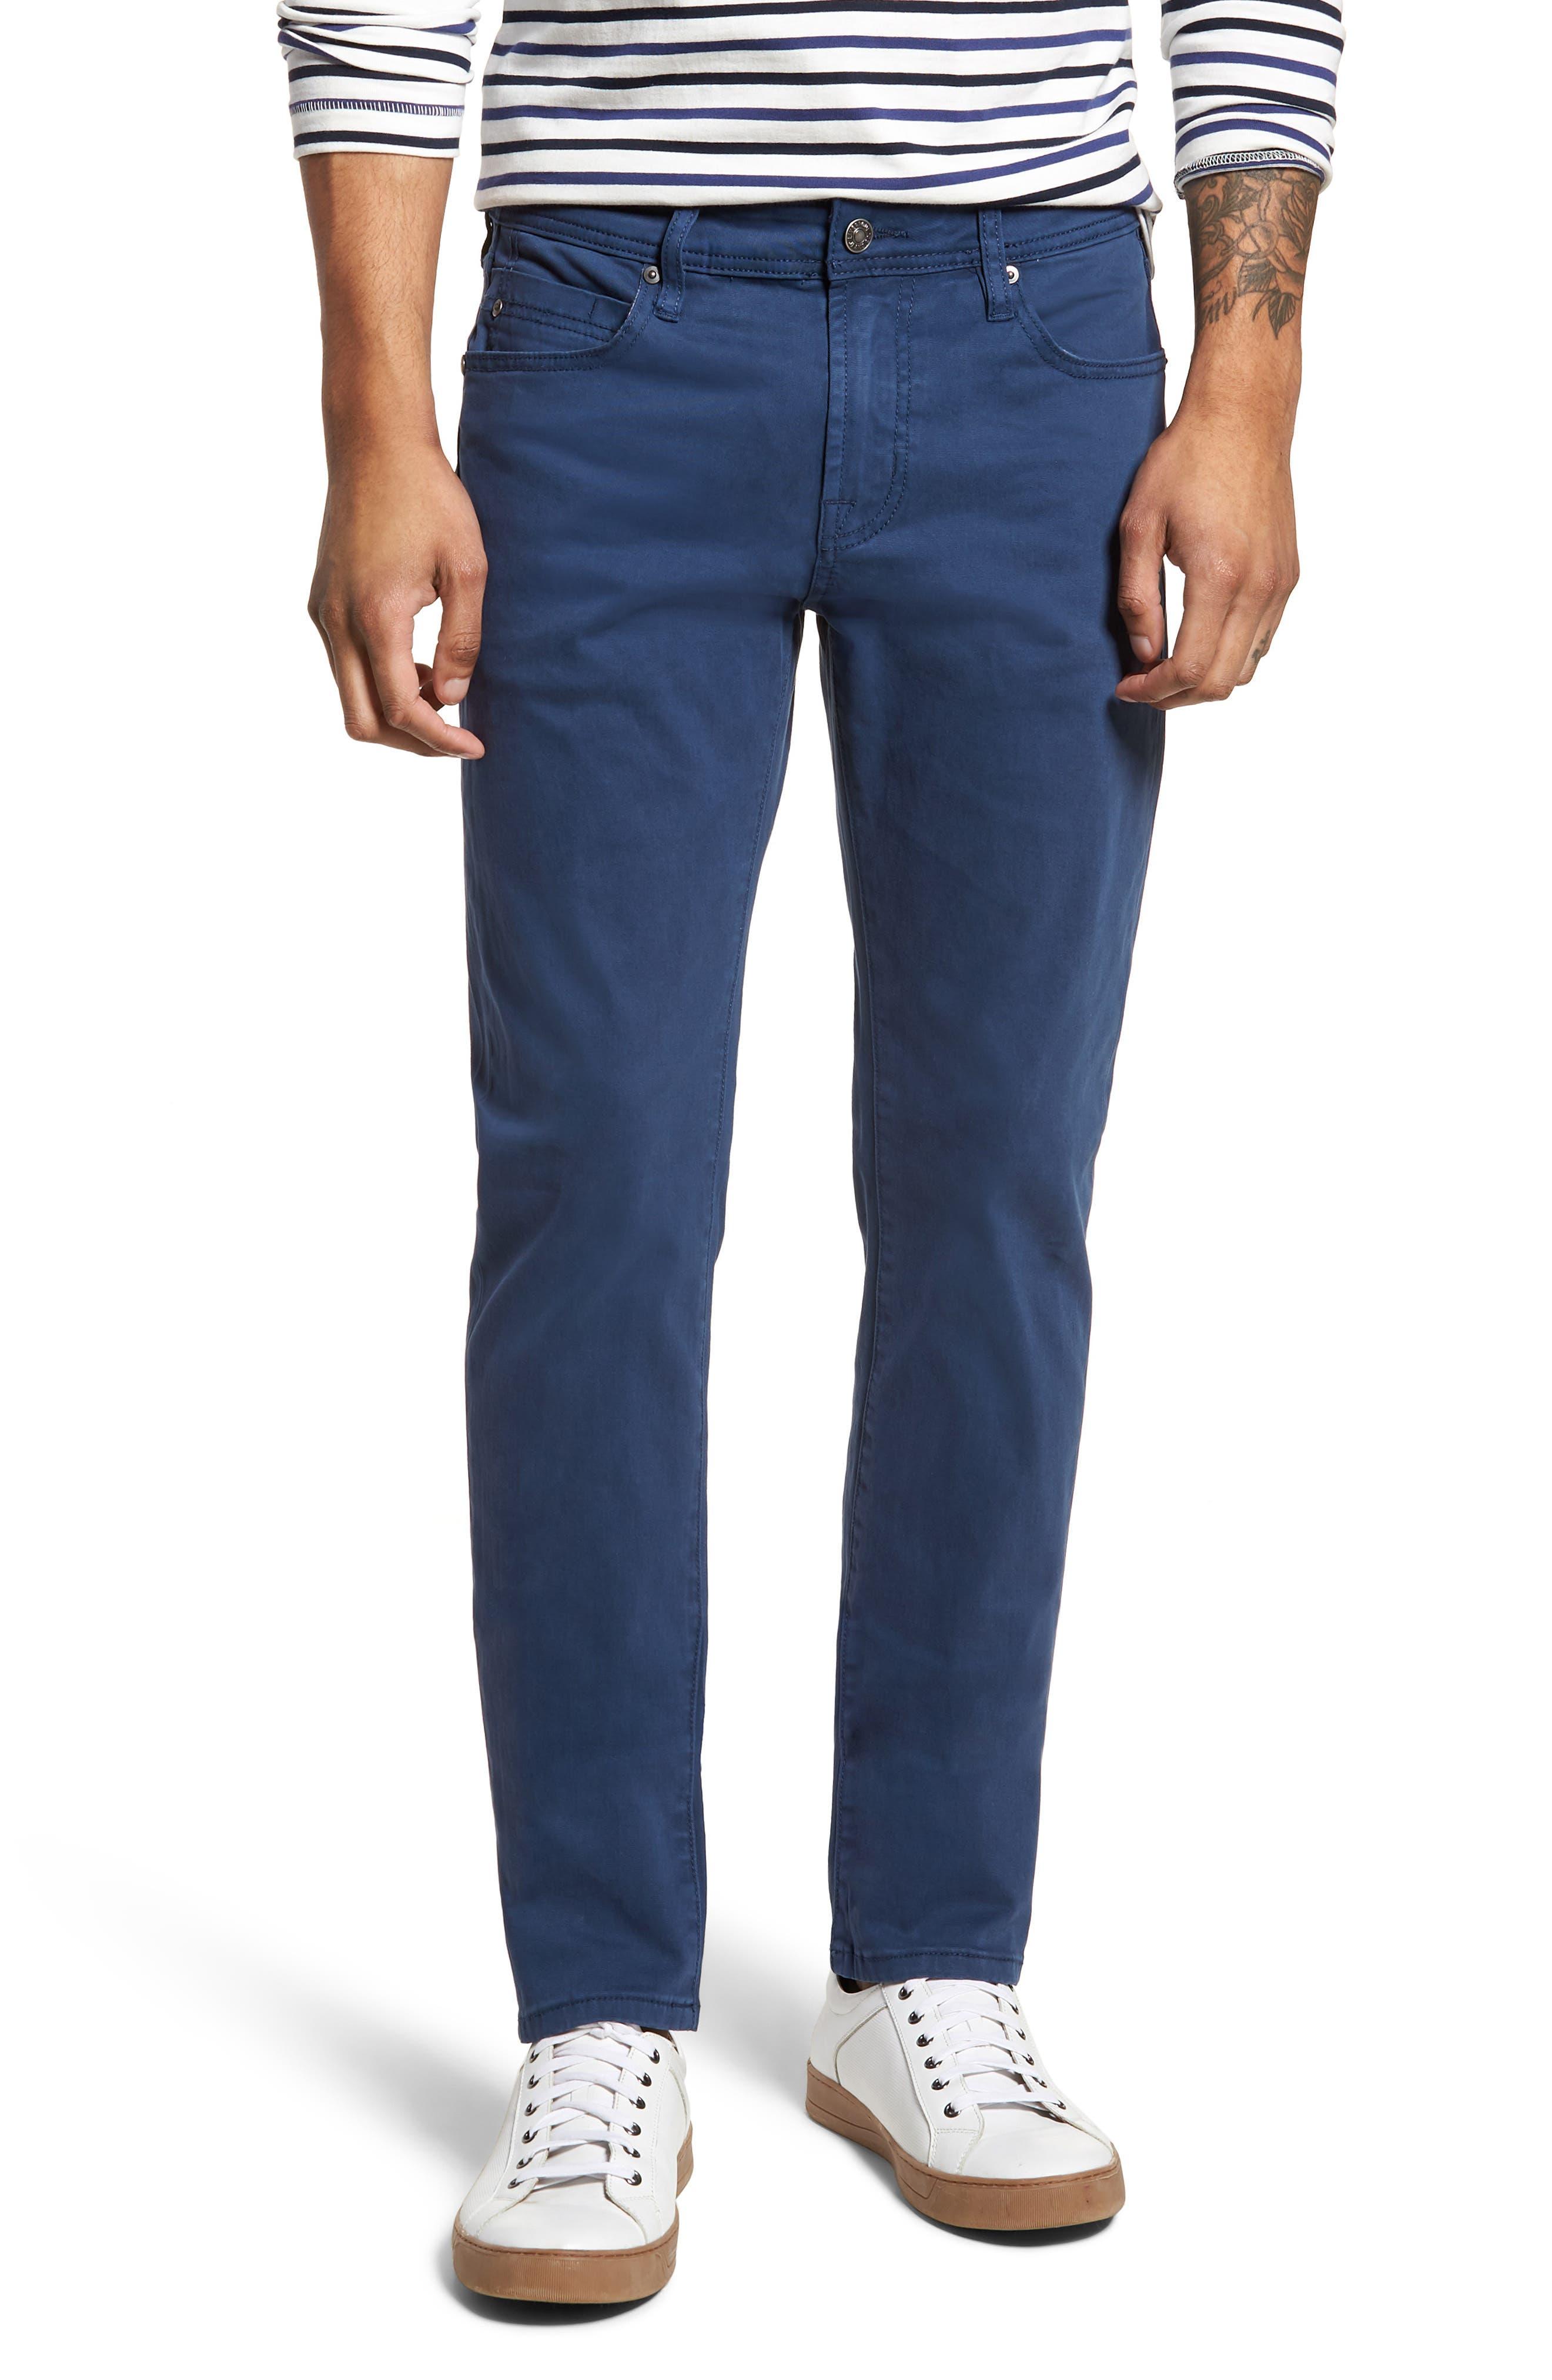 Main Image - Liverpool Jeans Co. Kingston Slim Straight Leg Jeans (Blue Twilight)